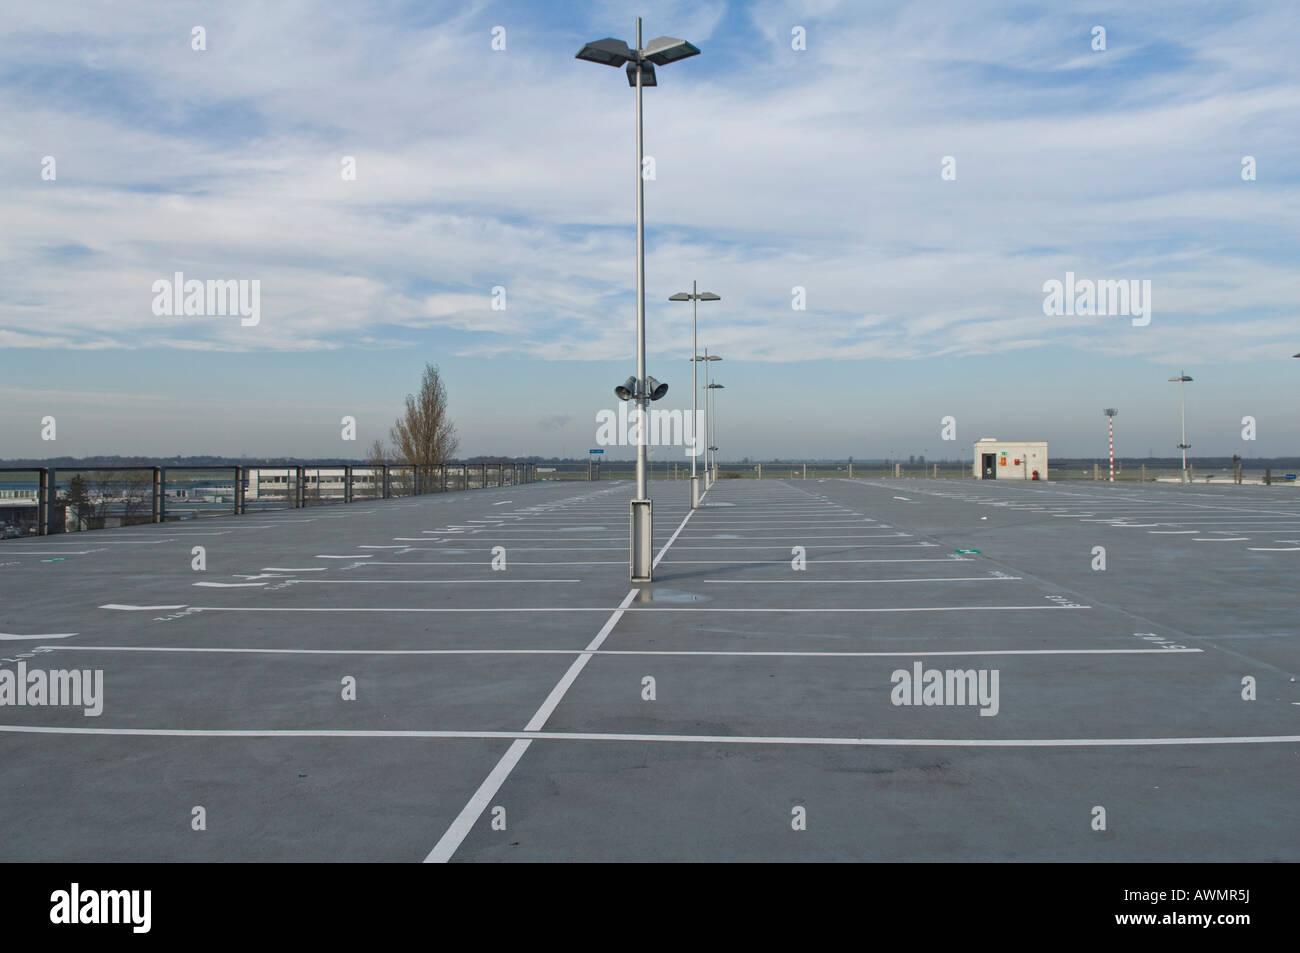 long term parking stock photos long term parking stock. Black Bedroom Furniture Sets. Home Design Ideas